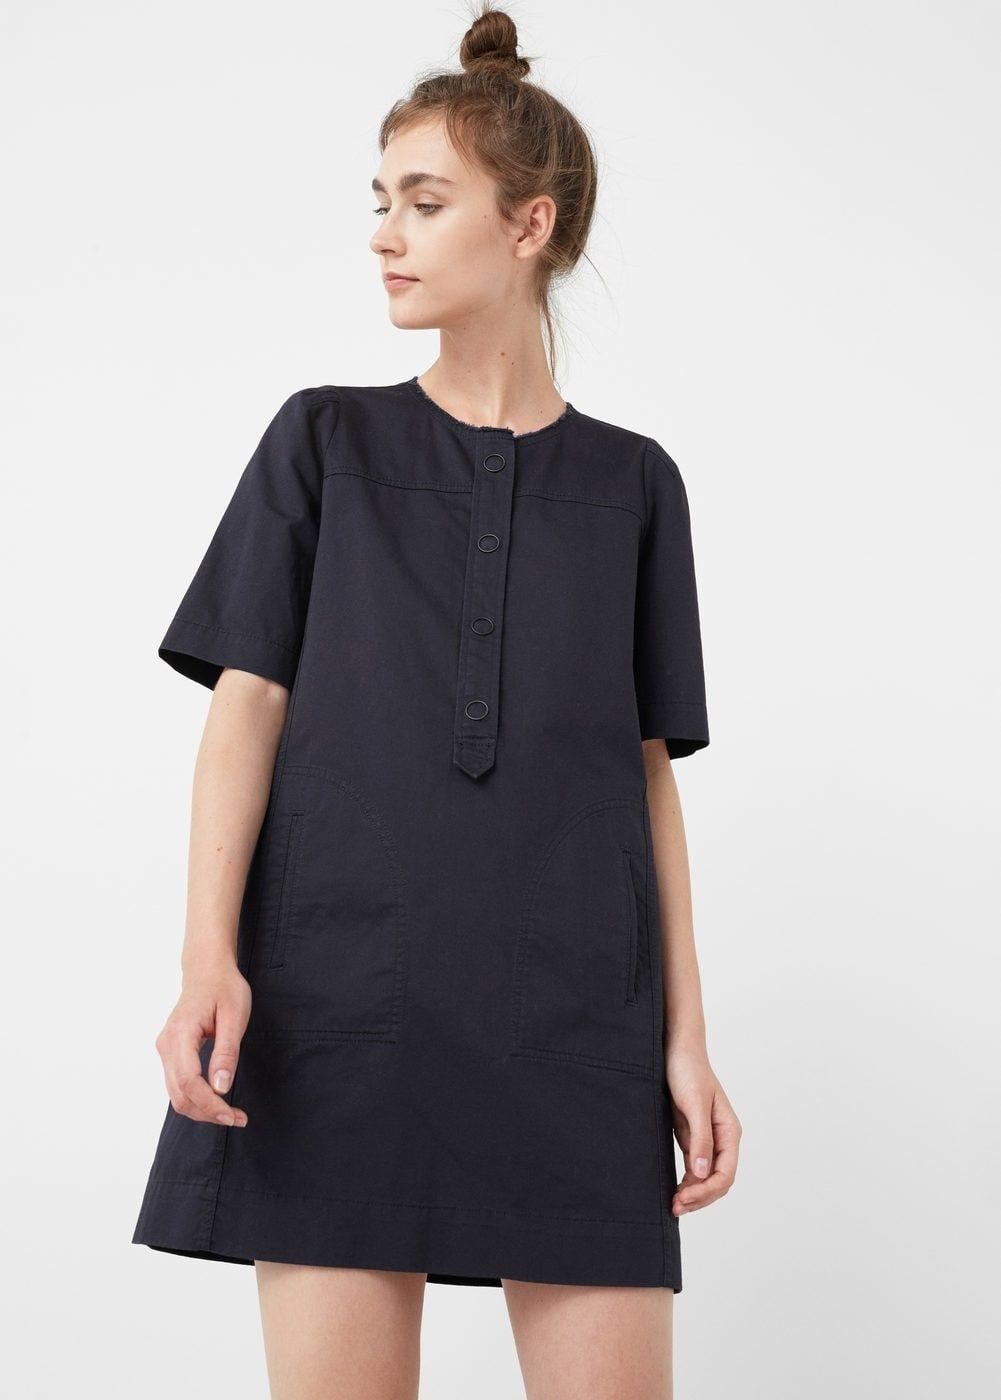 20 Coolste Kurze Kleider Boutique13 Genial Kurze Kleider Ärmel